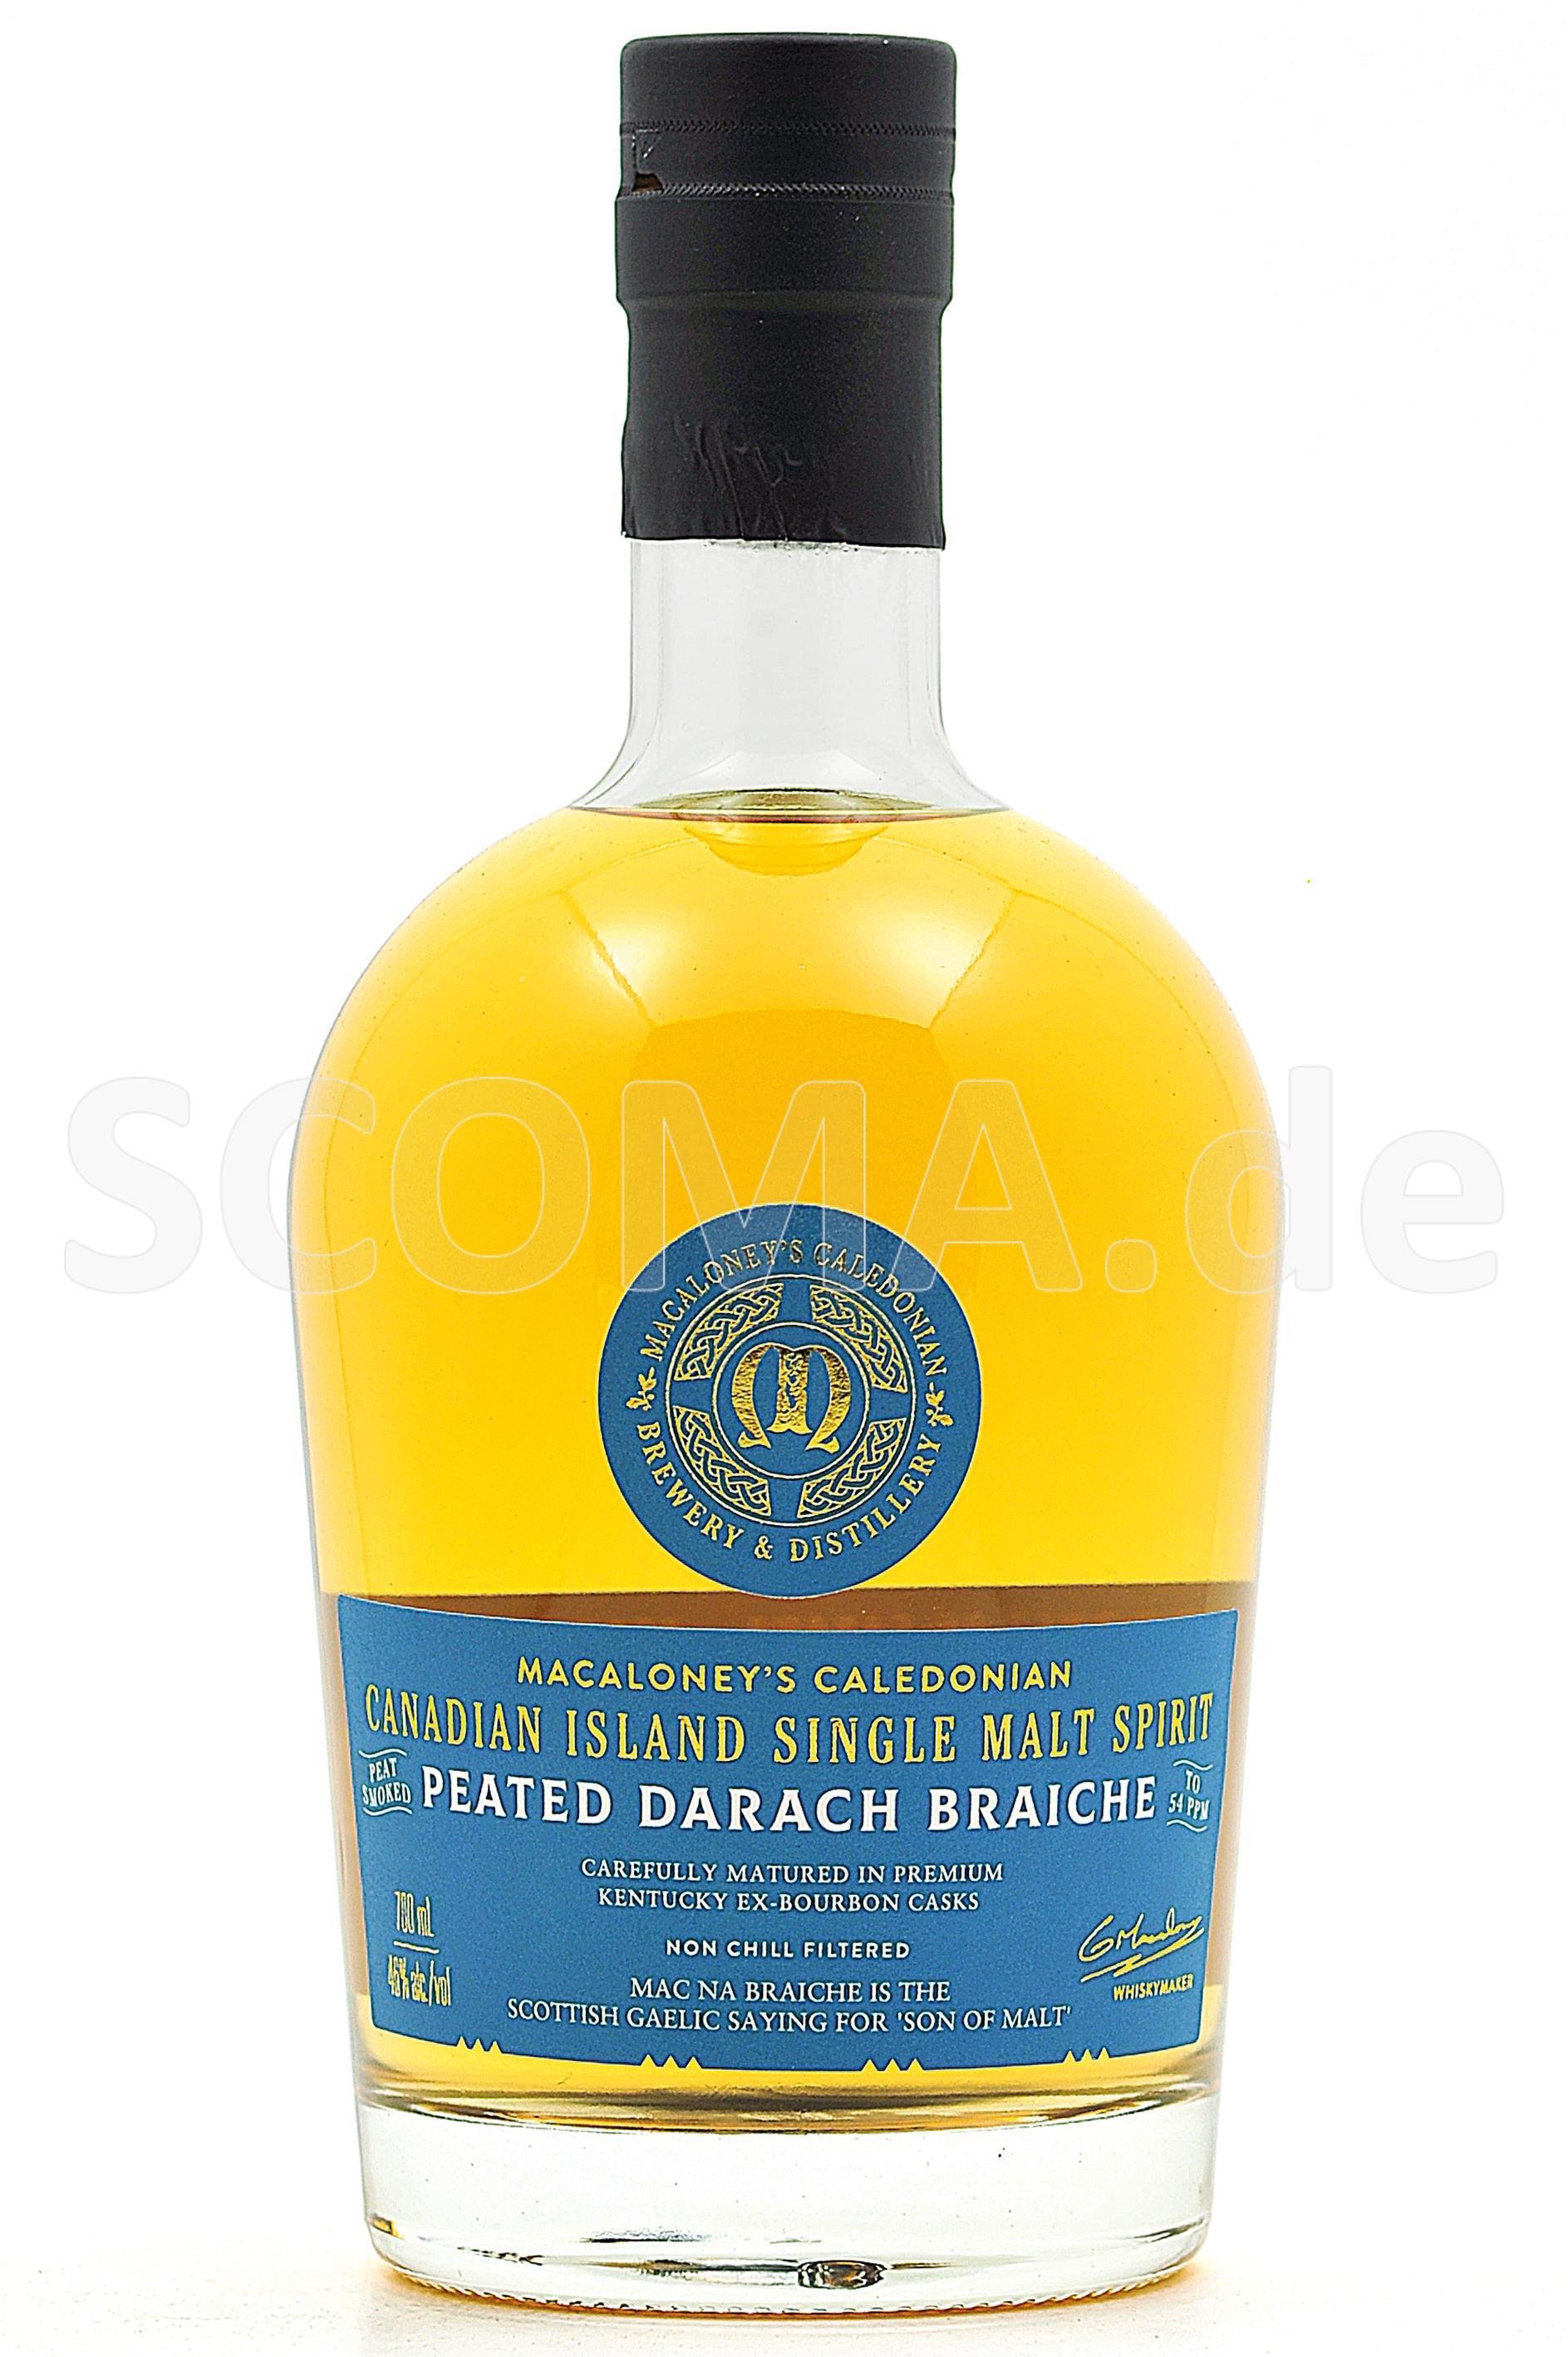 Macaloney's Caledonian Darach ...